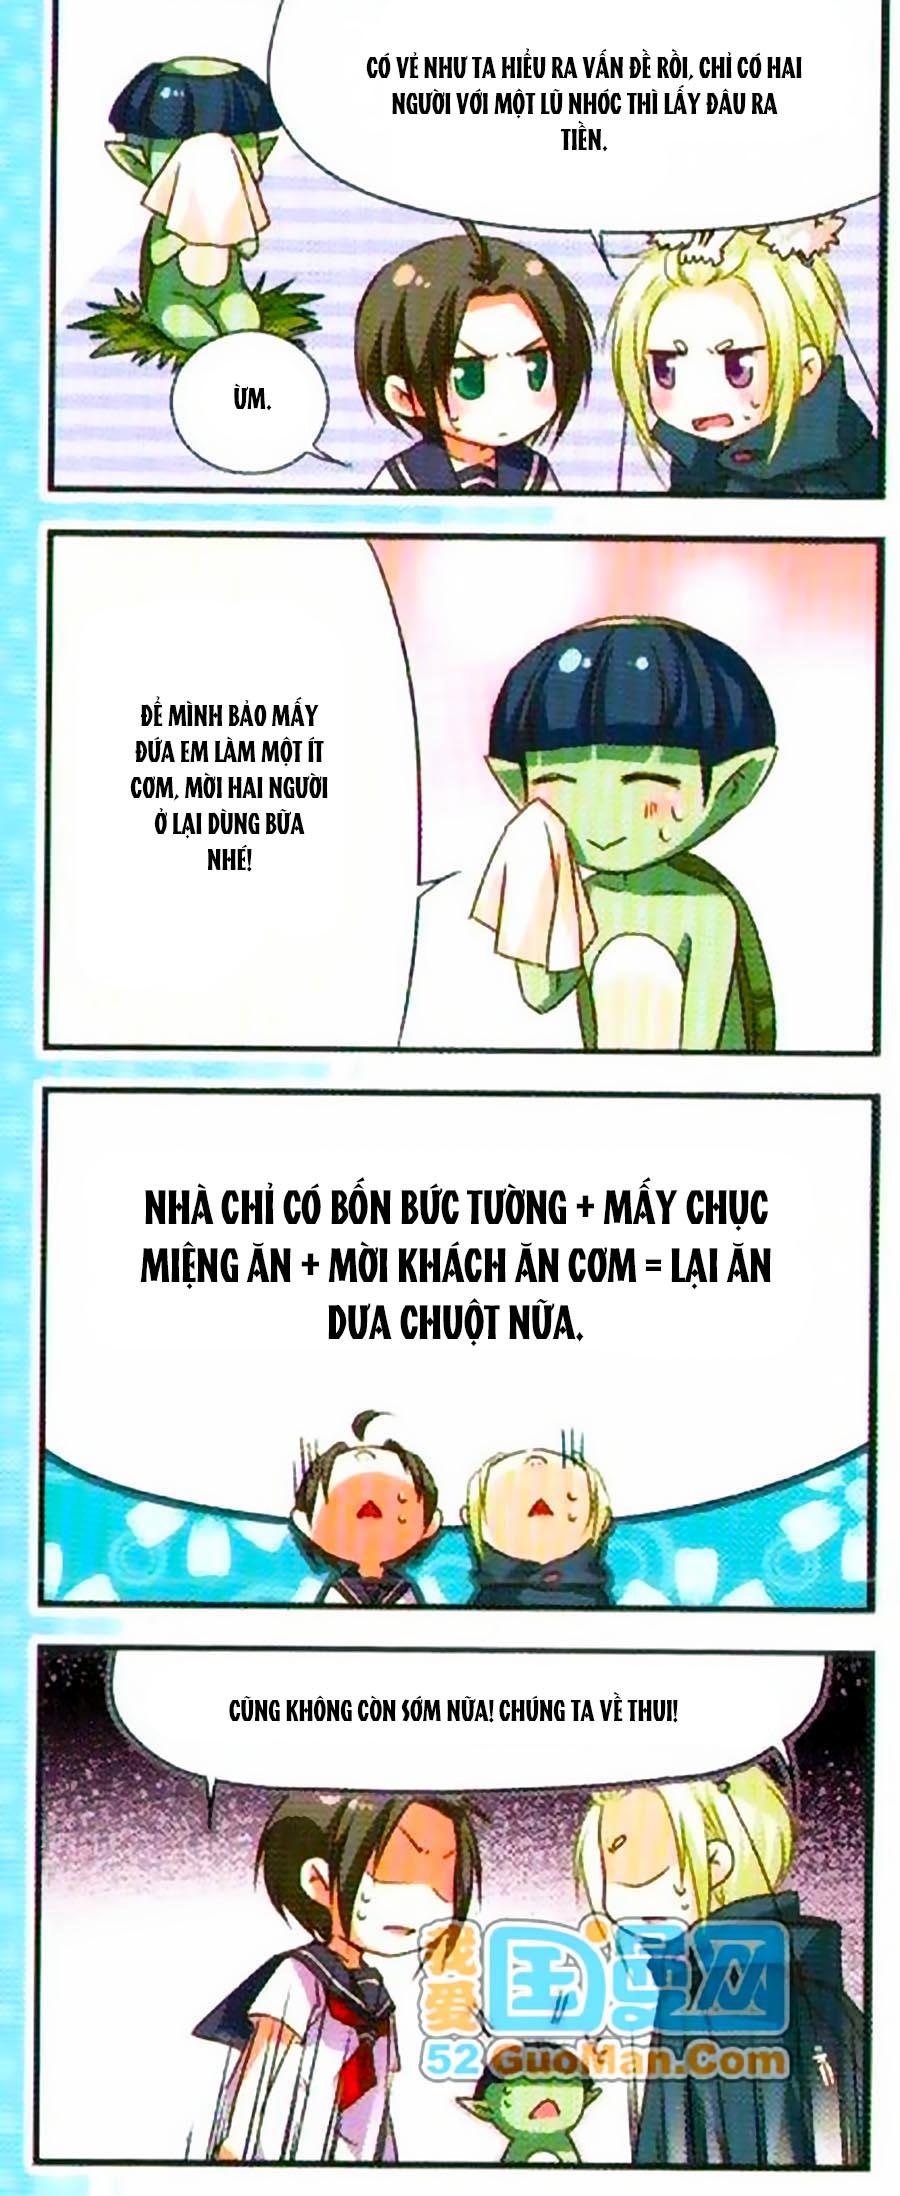 Manh Tam Quốc Chap 61 - Next Chap 62